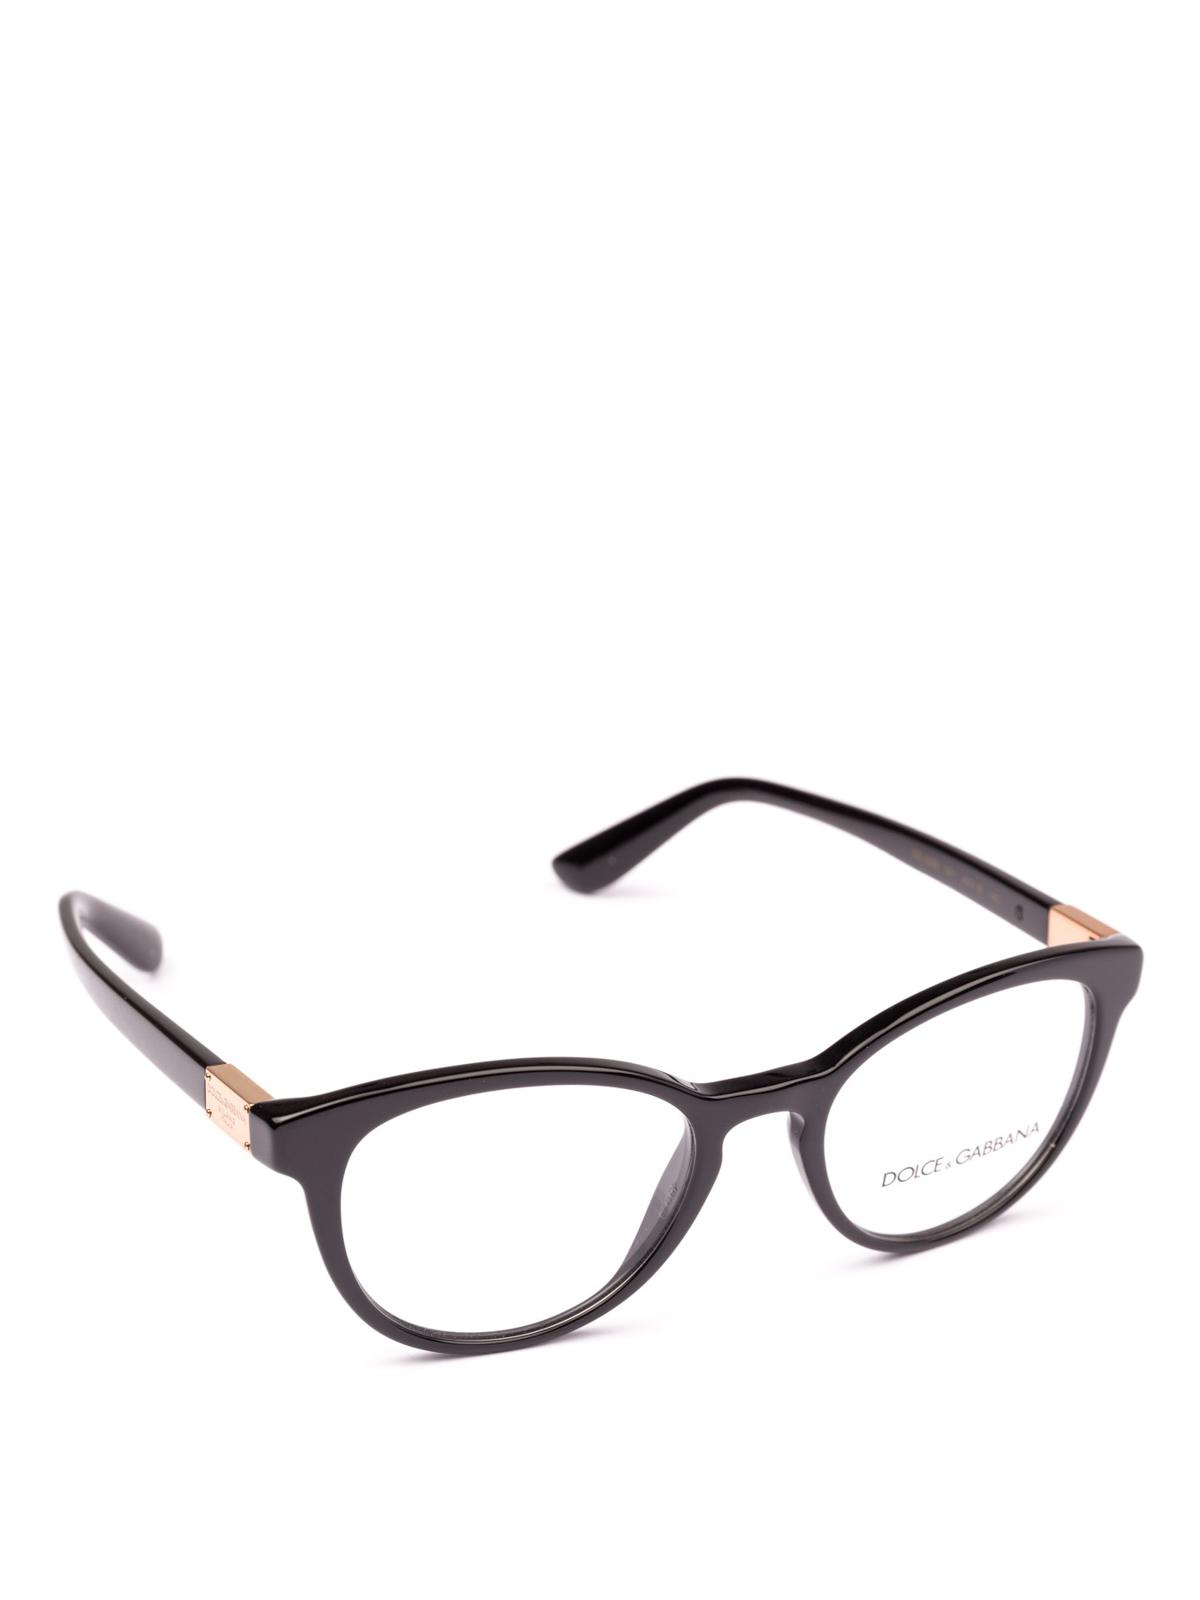 ce0dc975df2 Dolce   Gabbana - Black acetate pantos optical glasses - glasses ...